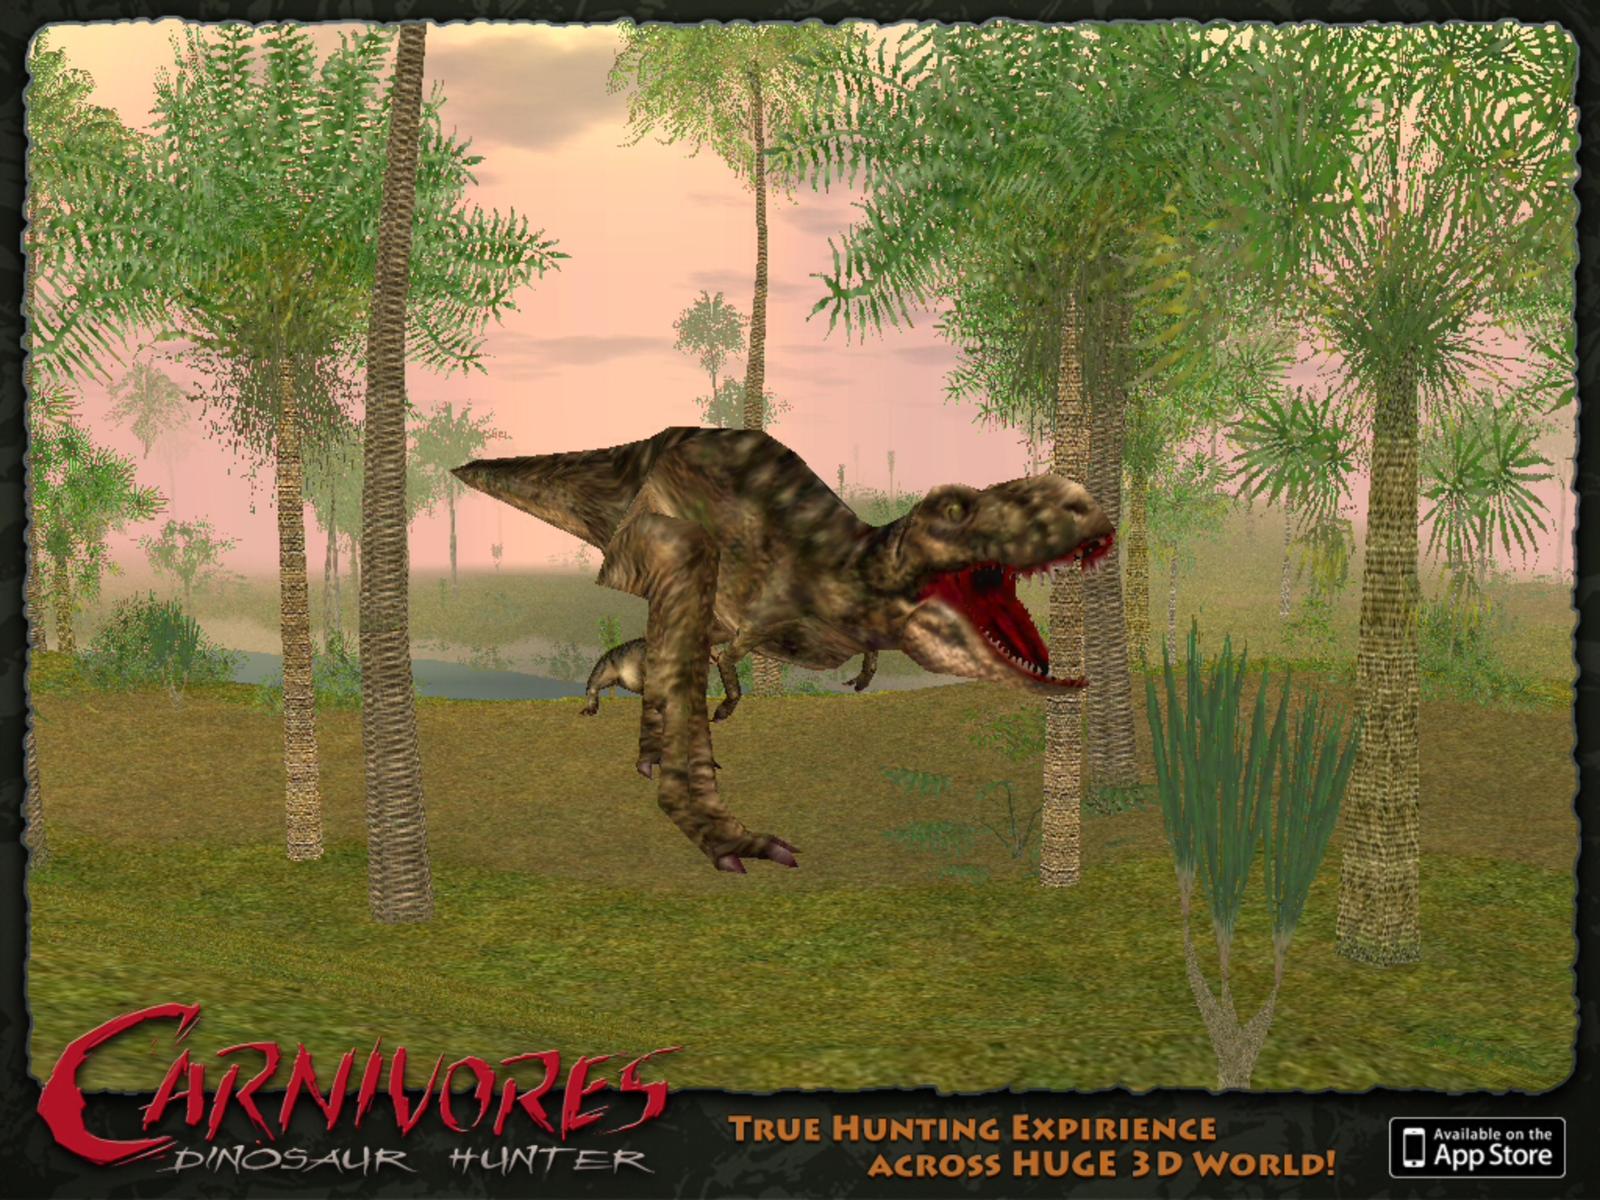 carnivores dinosaur hunter tyrannosaurus rex by 6500nya